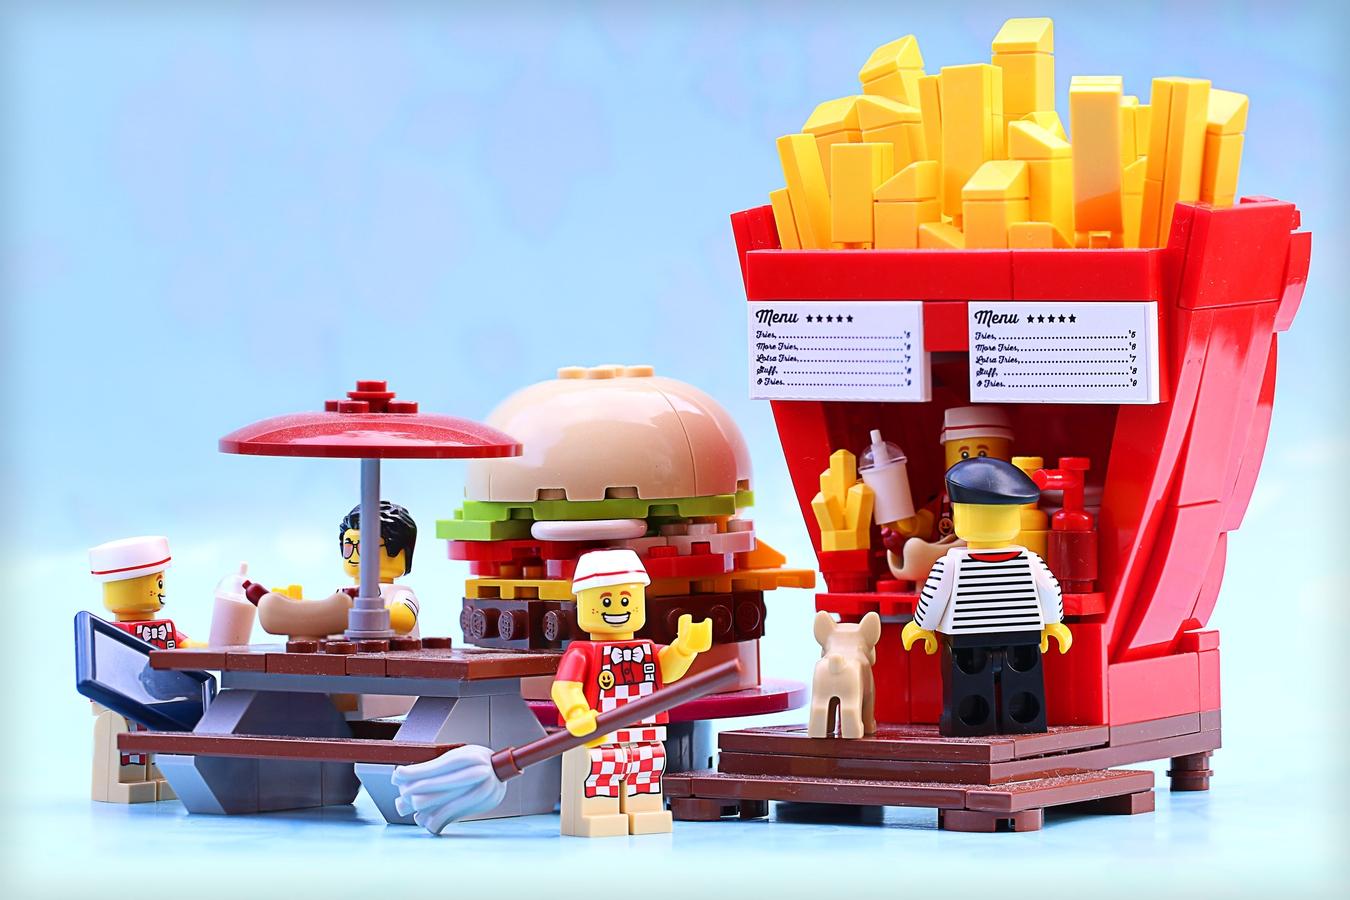 lego-ideas-food-stand-diners-front-frostbricks zusammengebaut.com